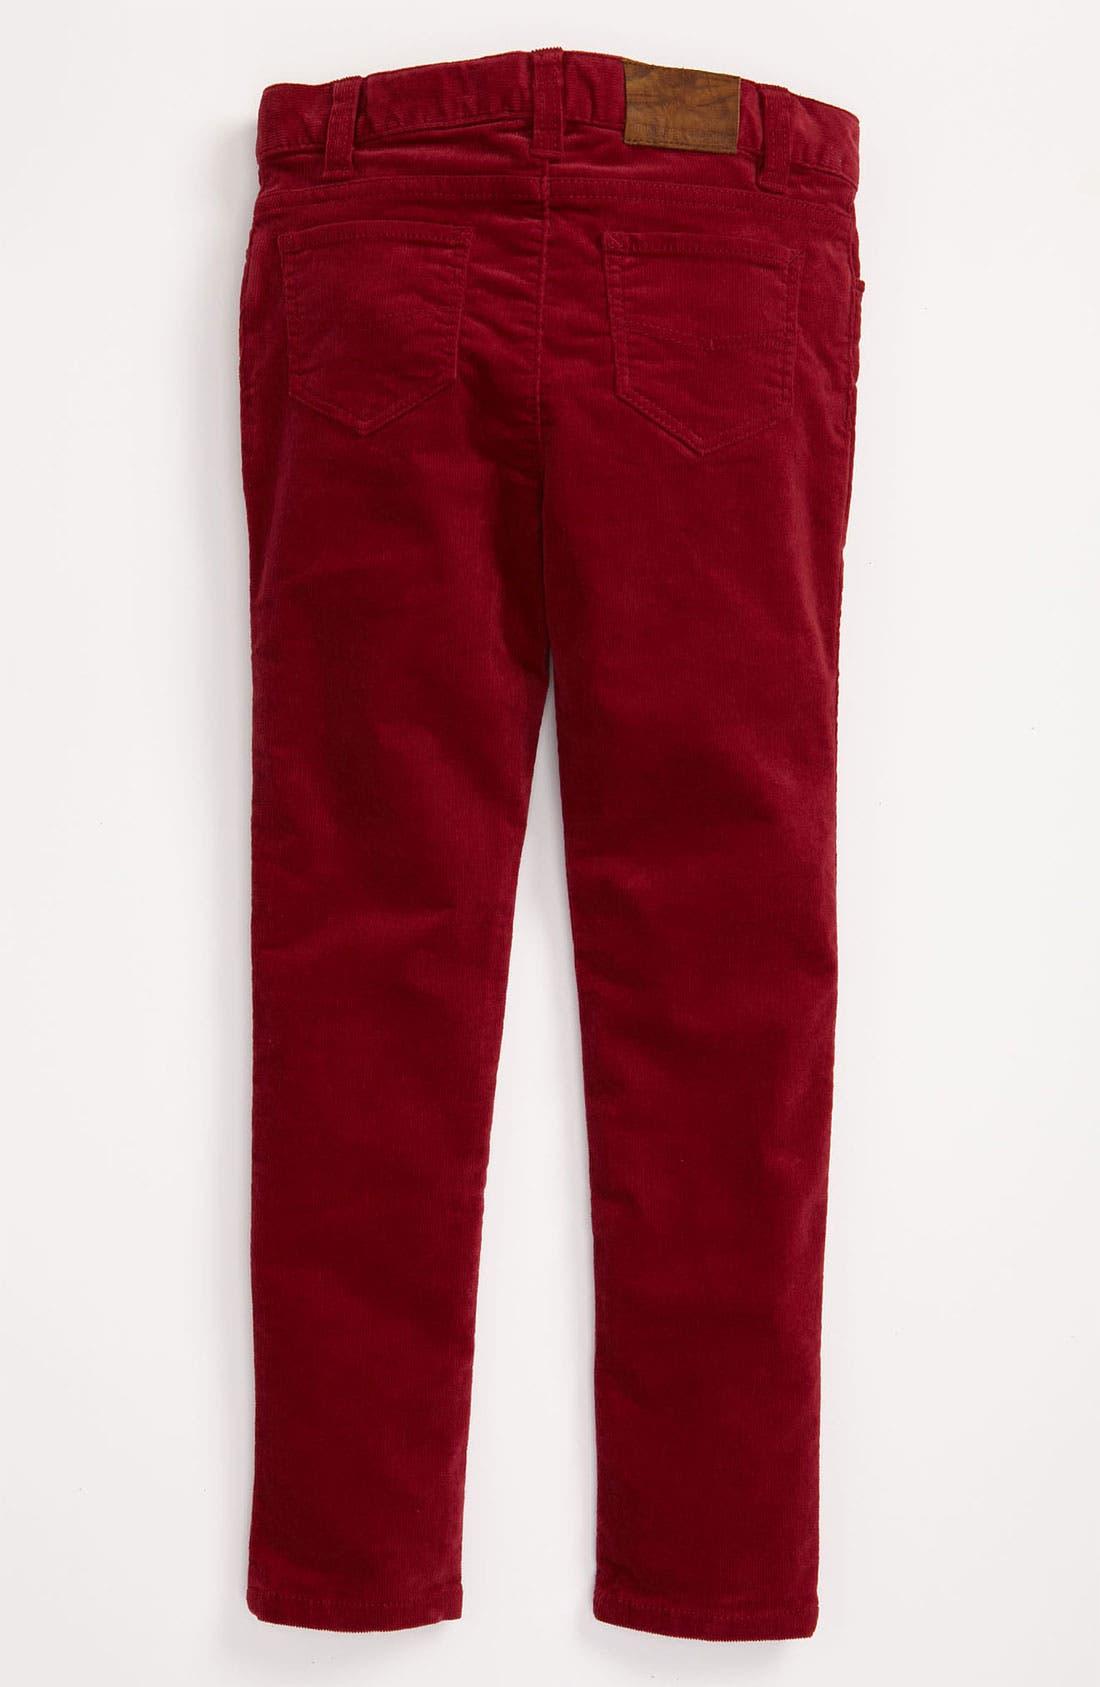 Alternate Image 1 Selected - Tucker + Tate 'Margaret' Corduroy Pants (Little Girls)